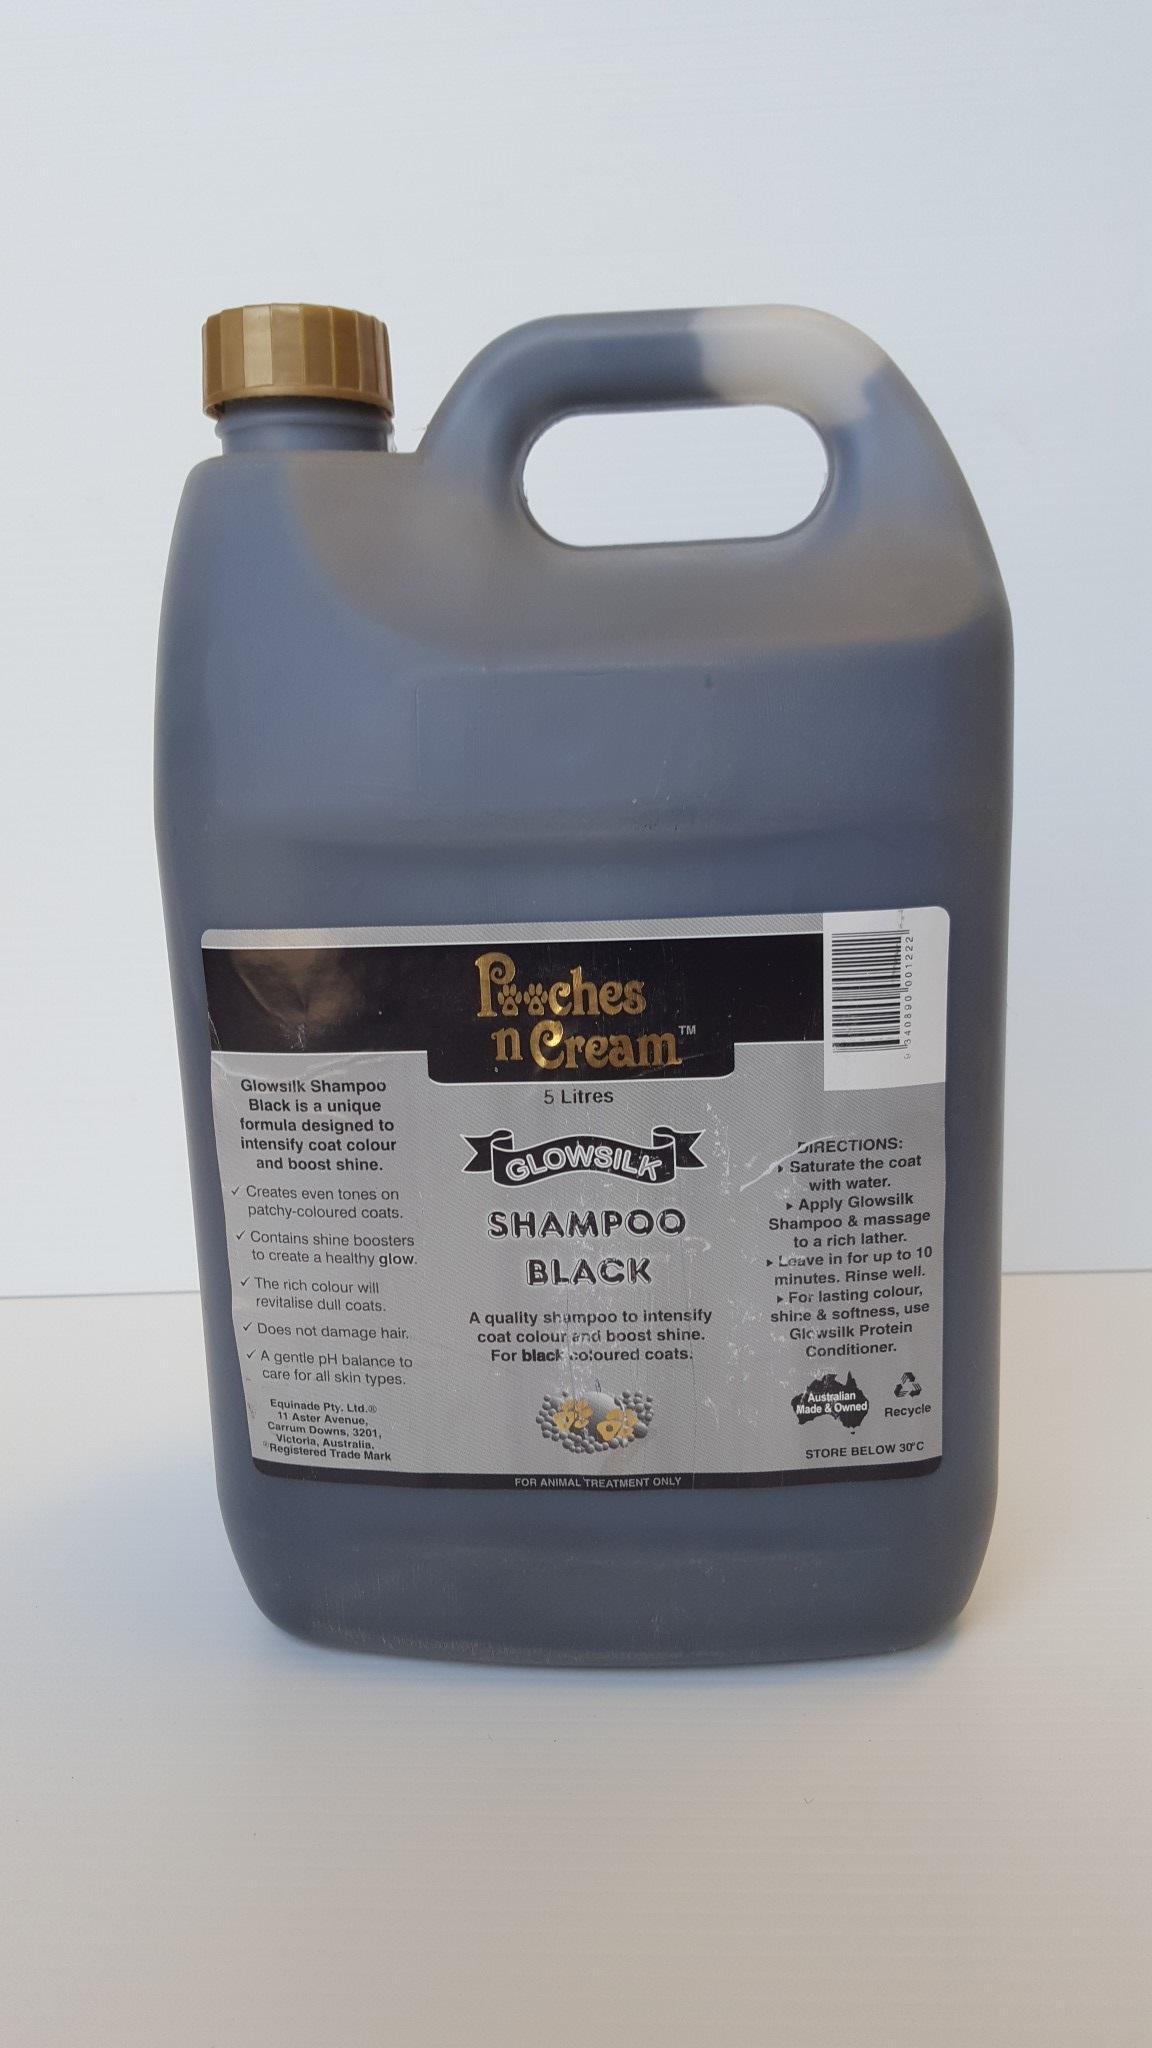 Pooches n Cream Glowsilk Shampoo - Black 5L